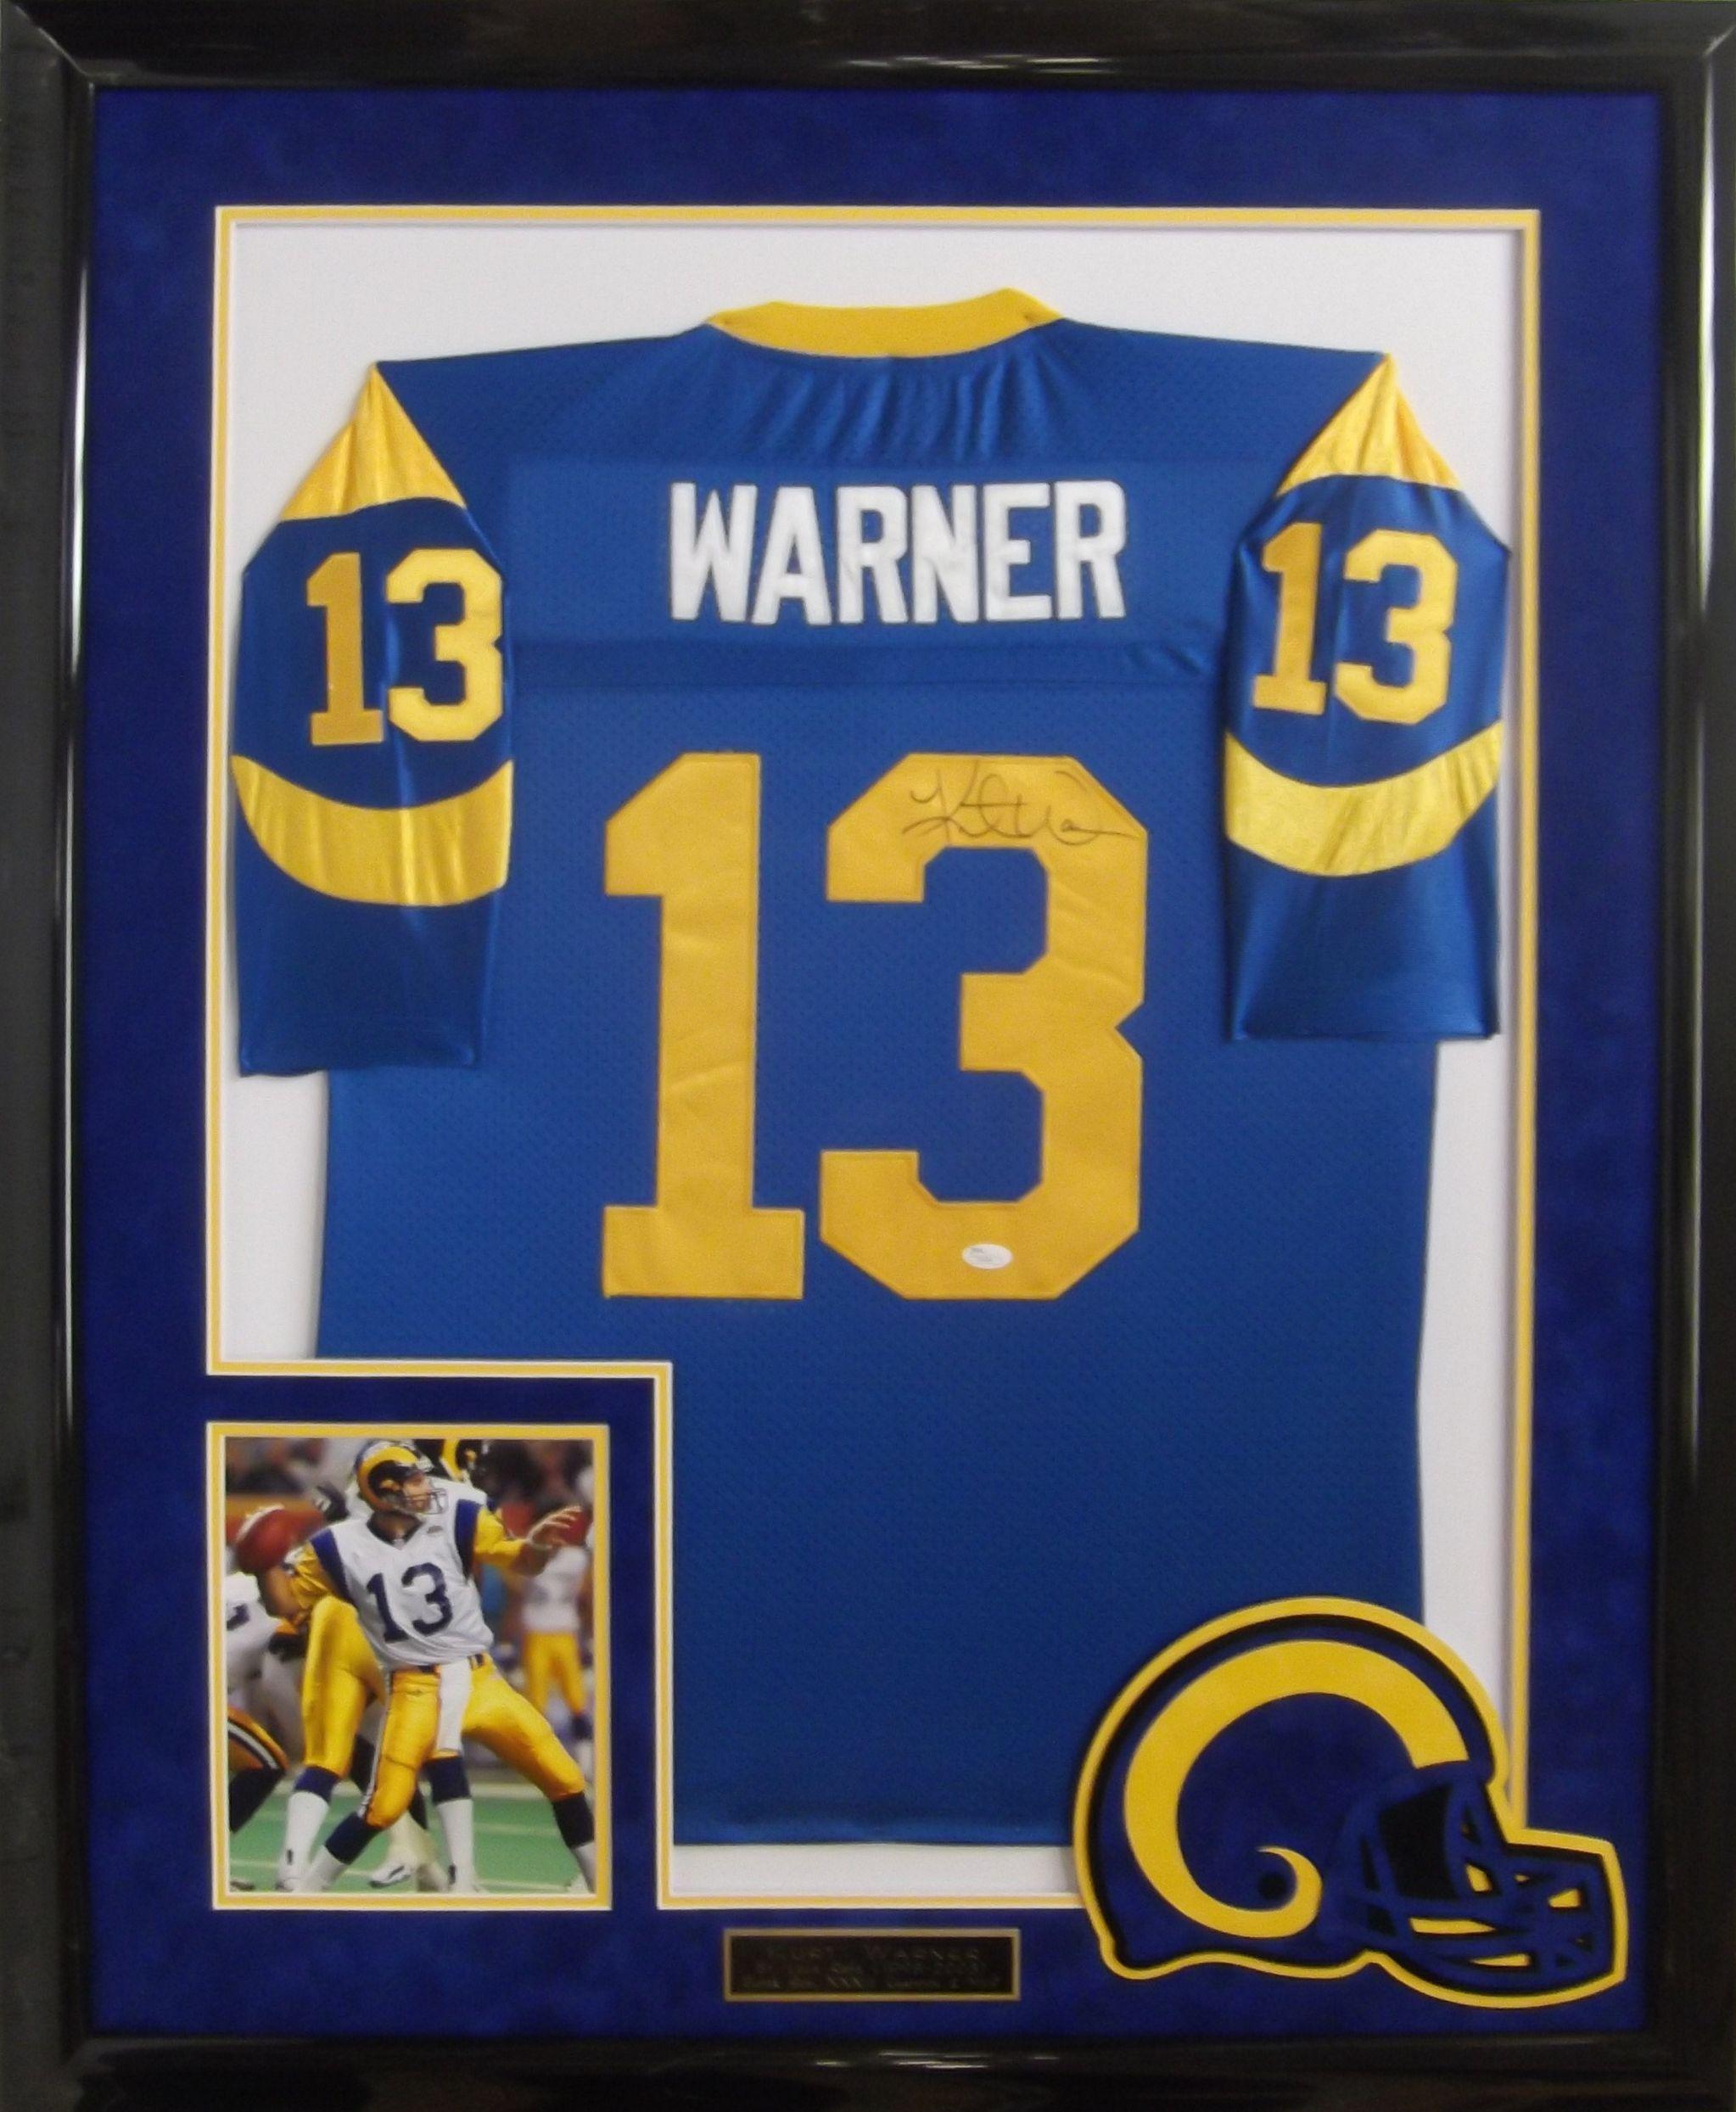 Kurt Warner autographed jersey framed & matted #SaintLouisRams #KurtWarner #sportsmemorabilia #customframing